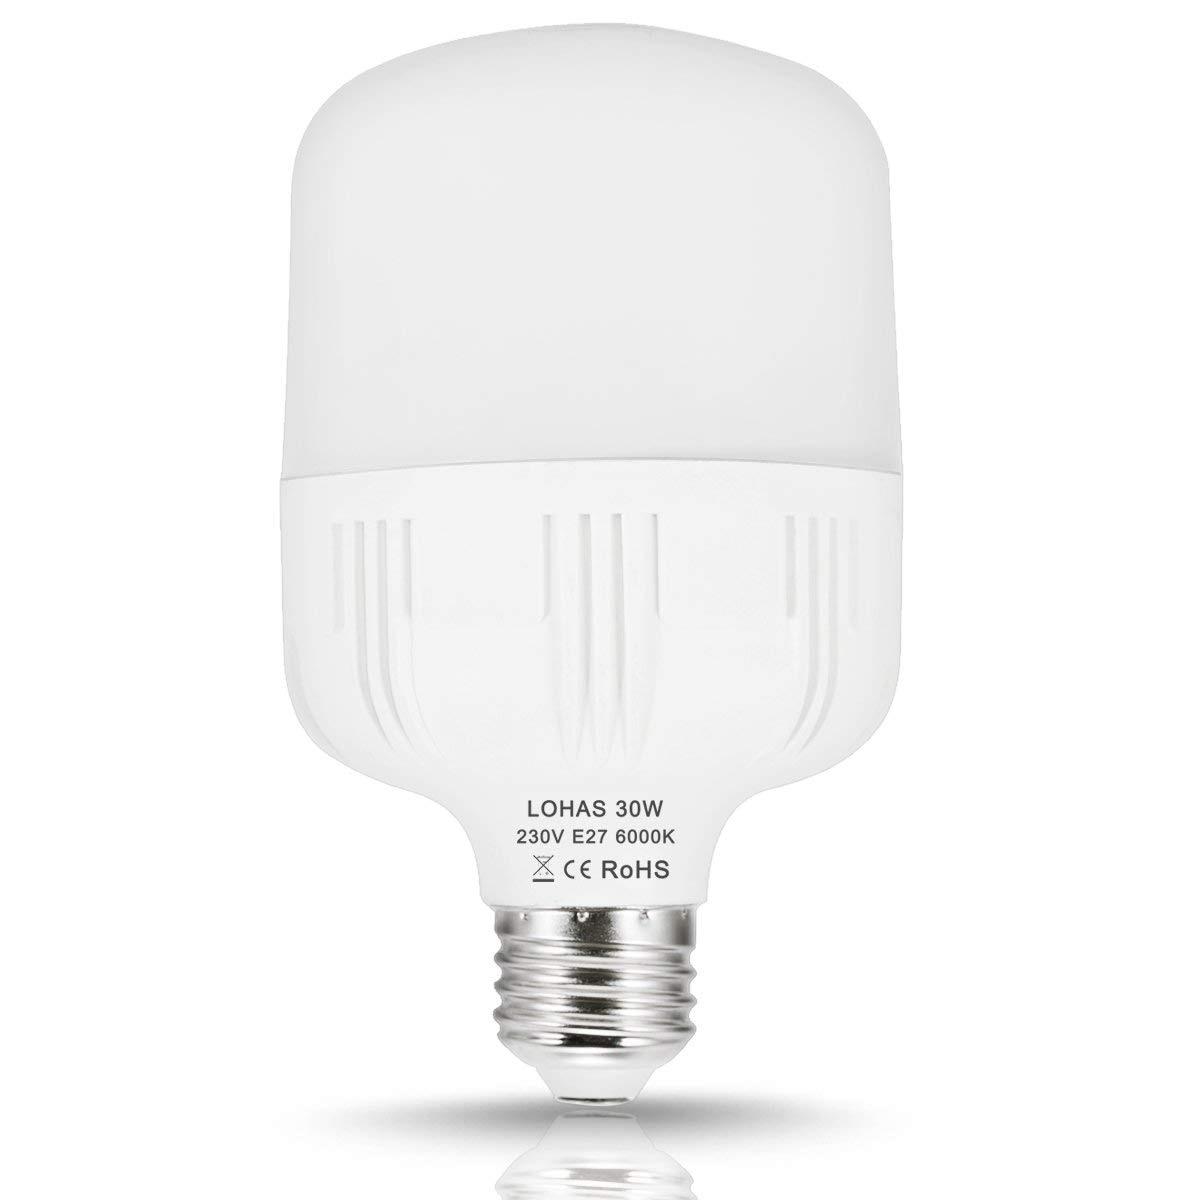 6000K B22 ULTRA BRIGHT WHITE LED ENERGY SAVING BULB LAMP B22 BAYONET NEW